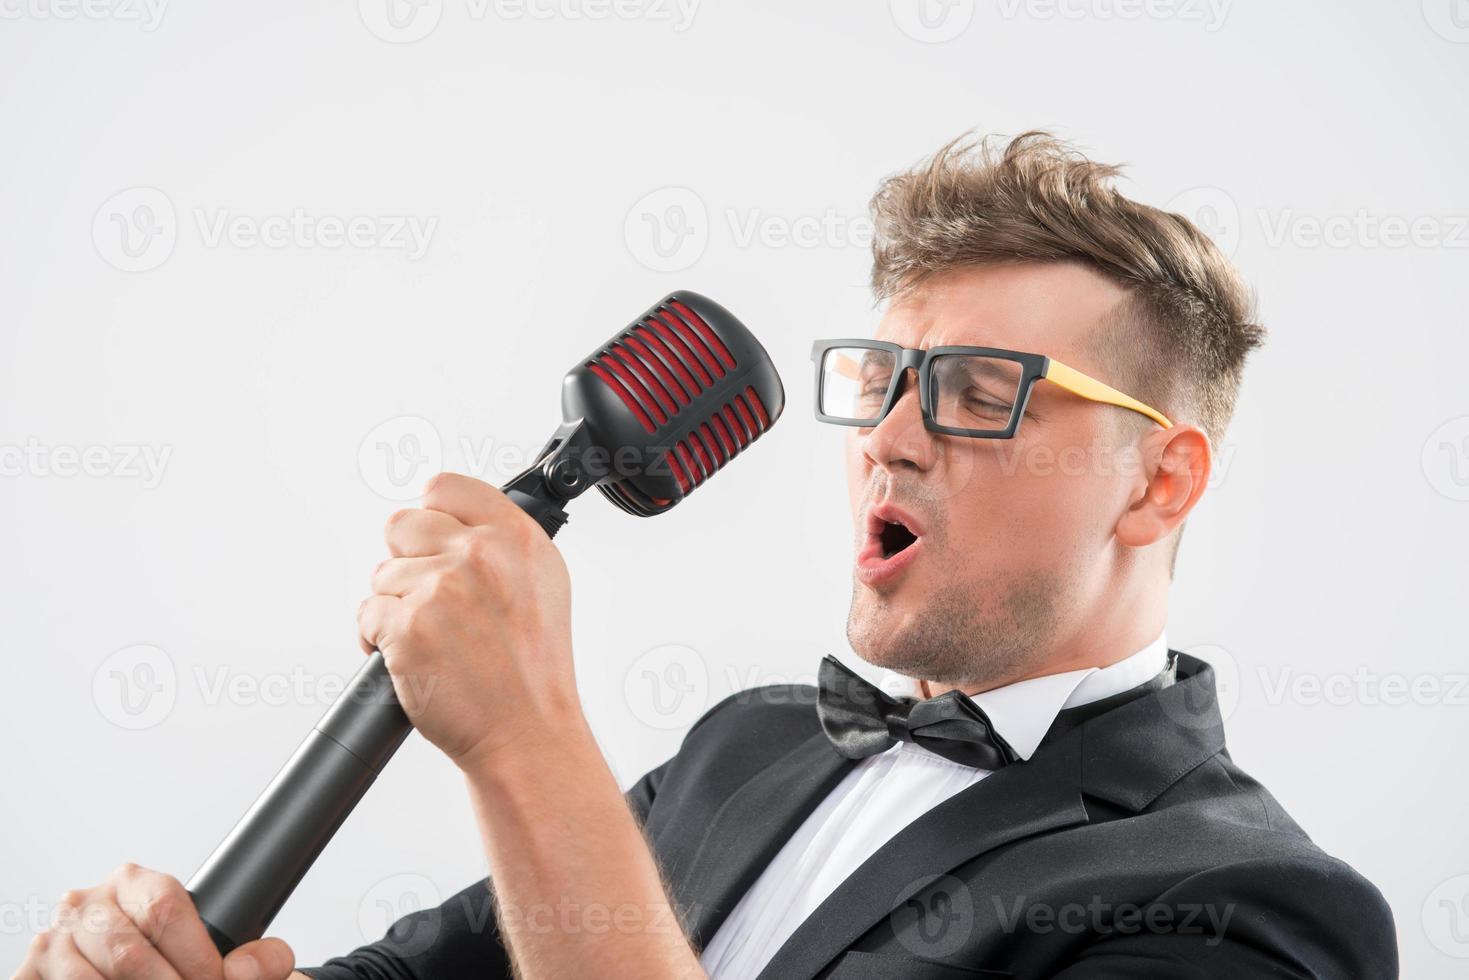 MC zingen in de microfoon foto